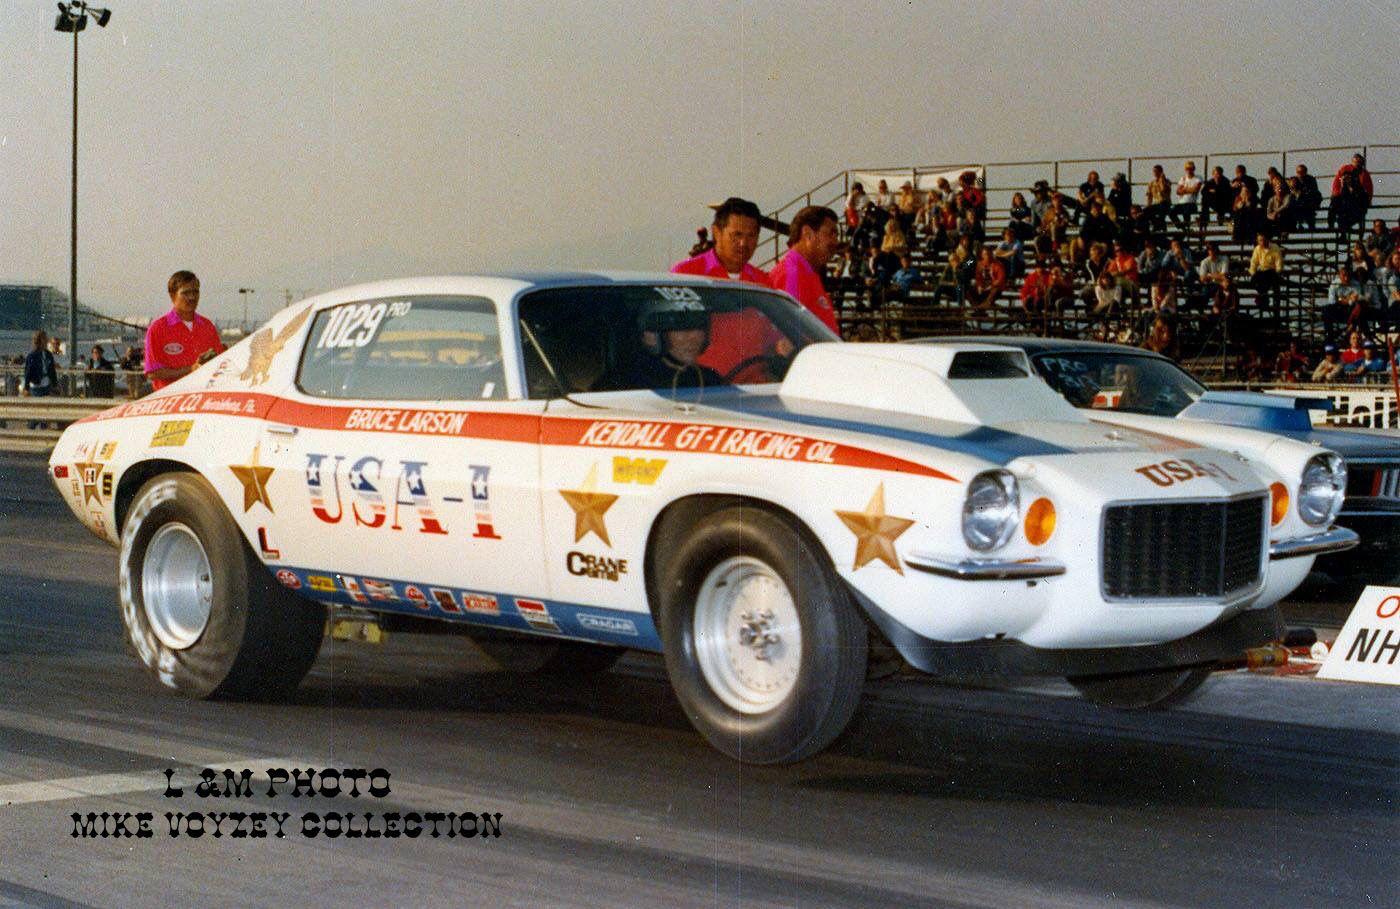 Bruce Larson. OldSchoolNHRA Drag racing cars, Old race